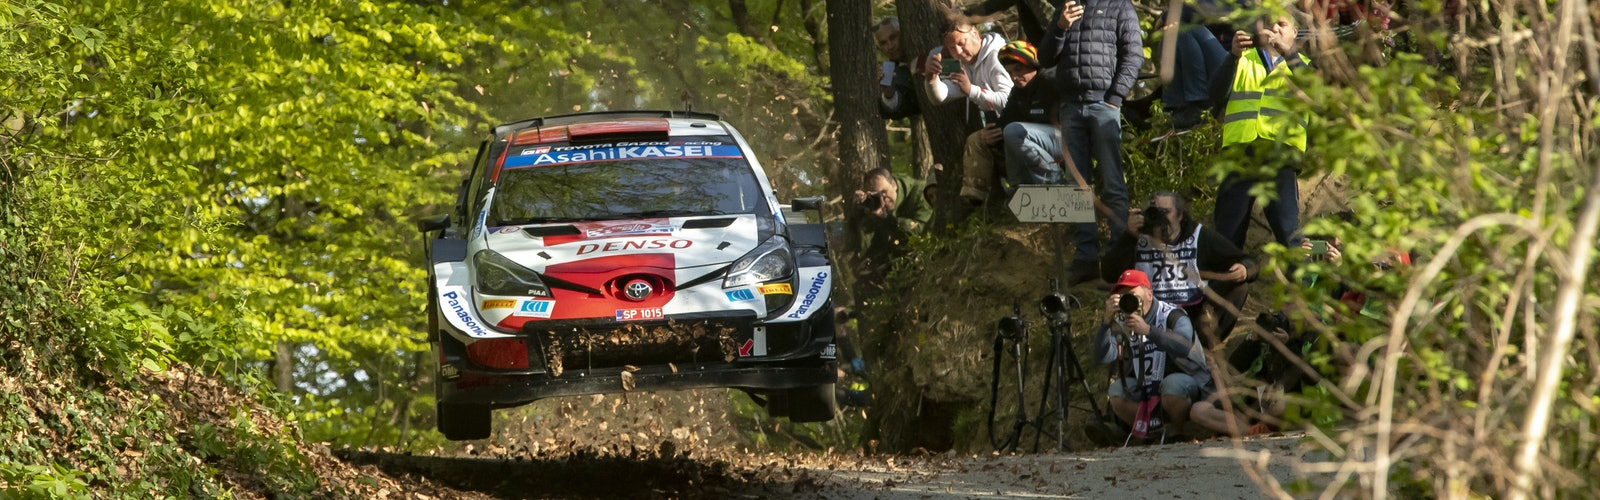 WRC_2021_Rd.3_289